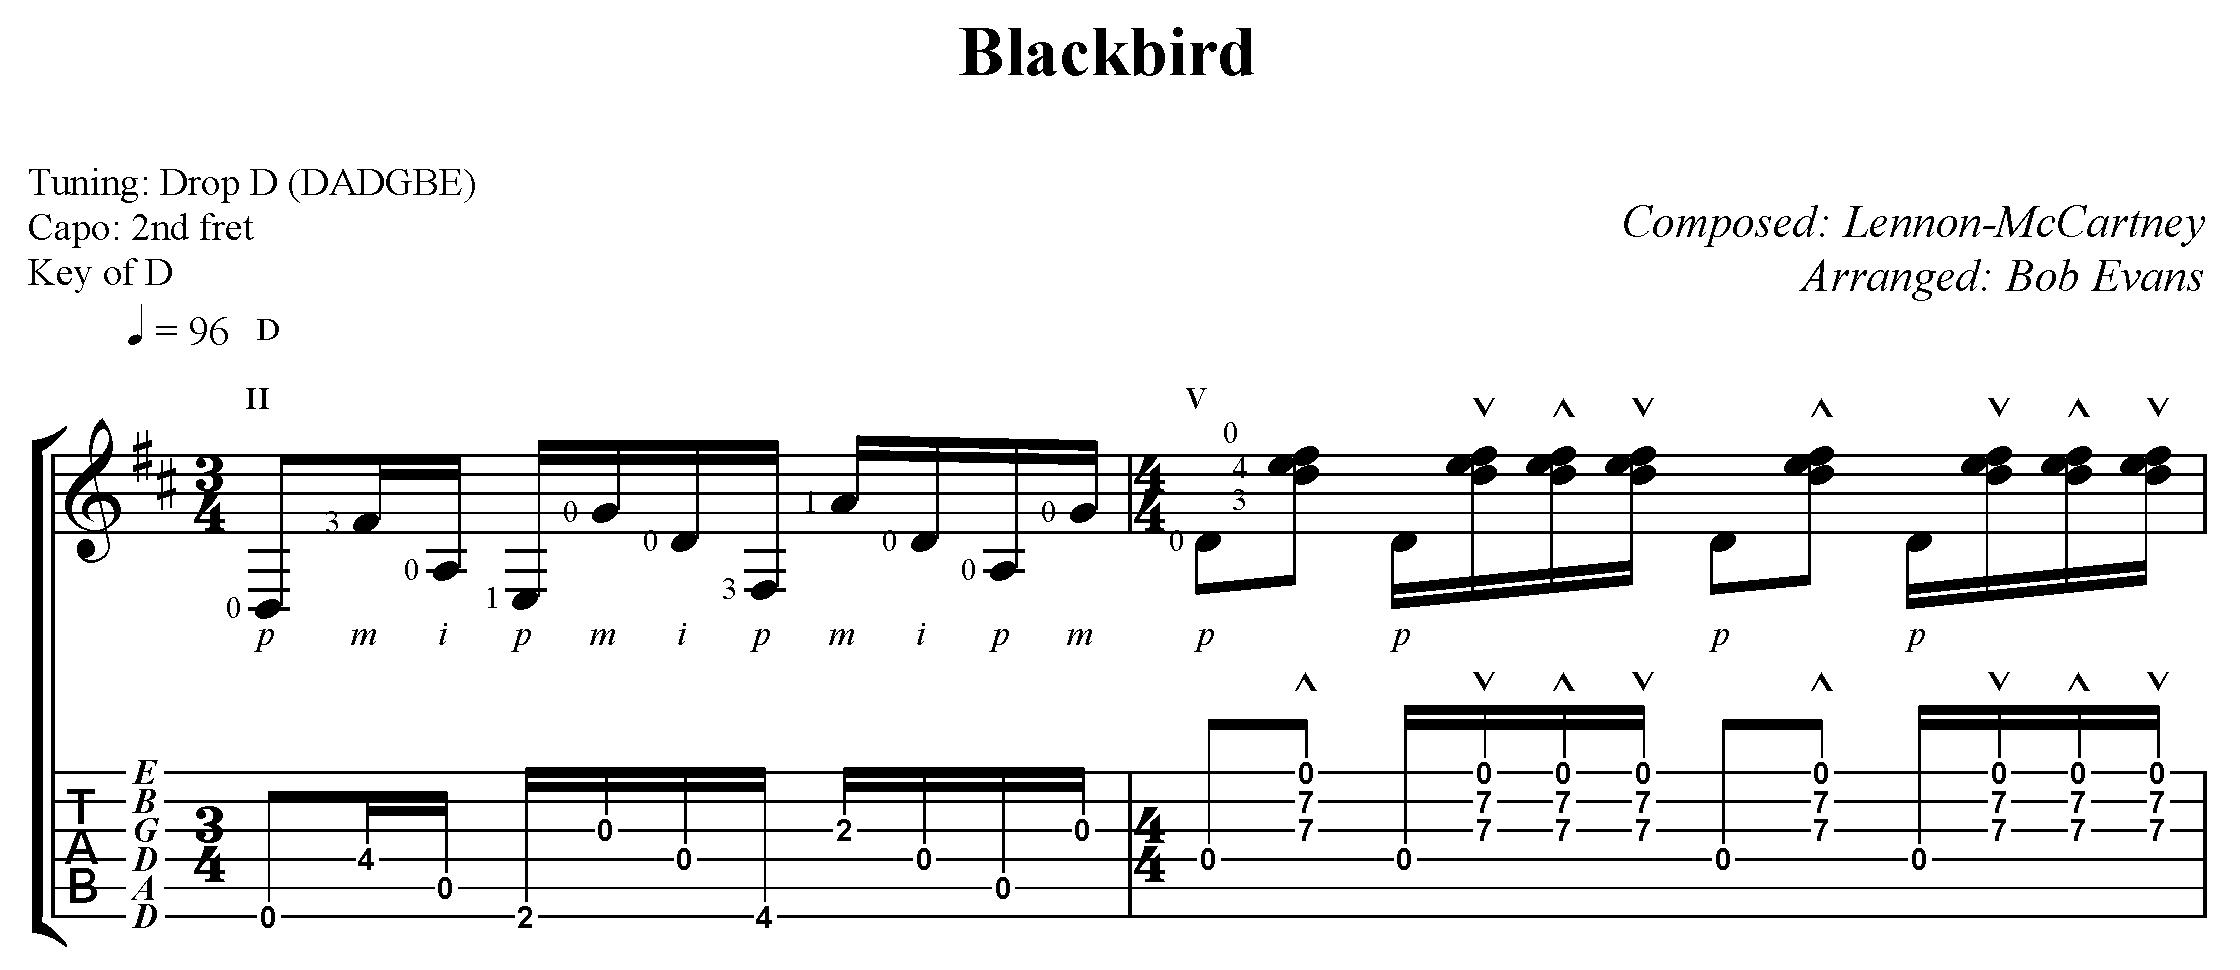 ATTD015-blackbird-thumbnail